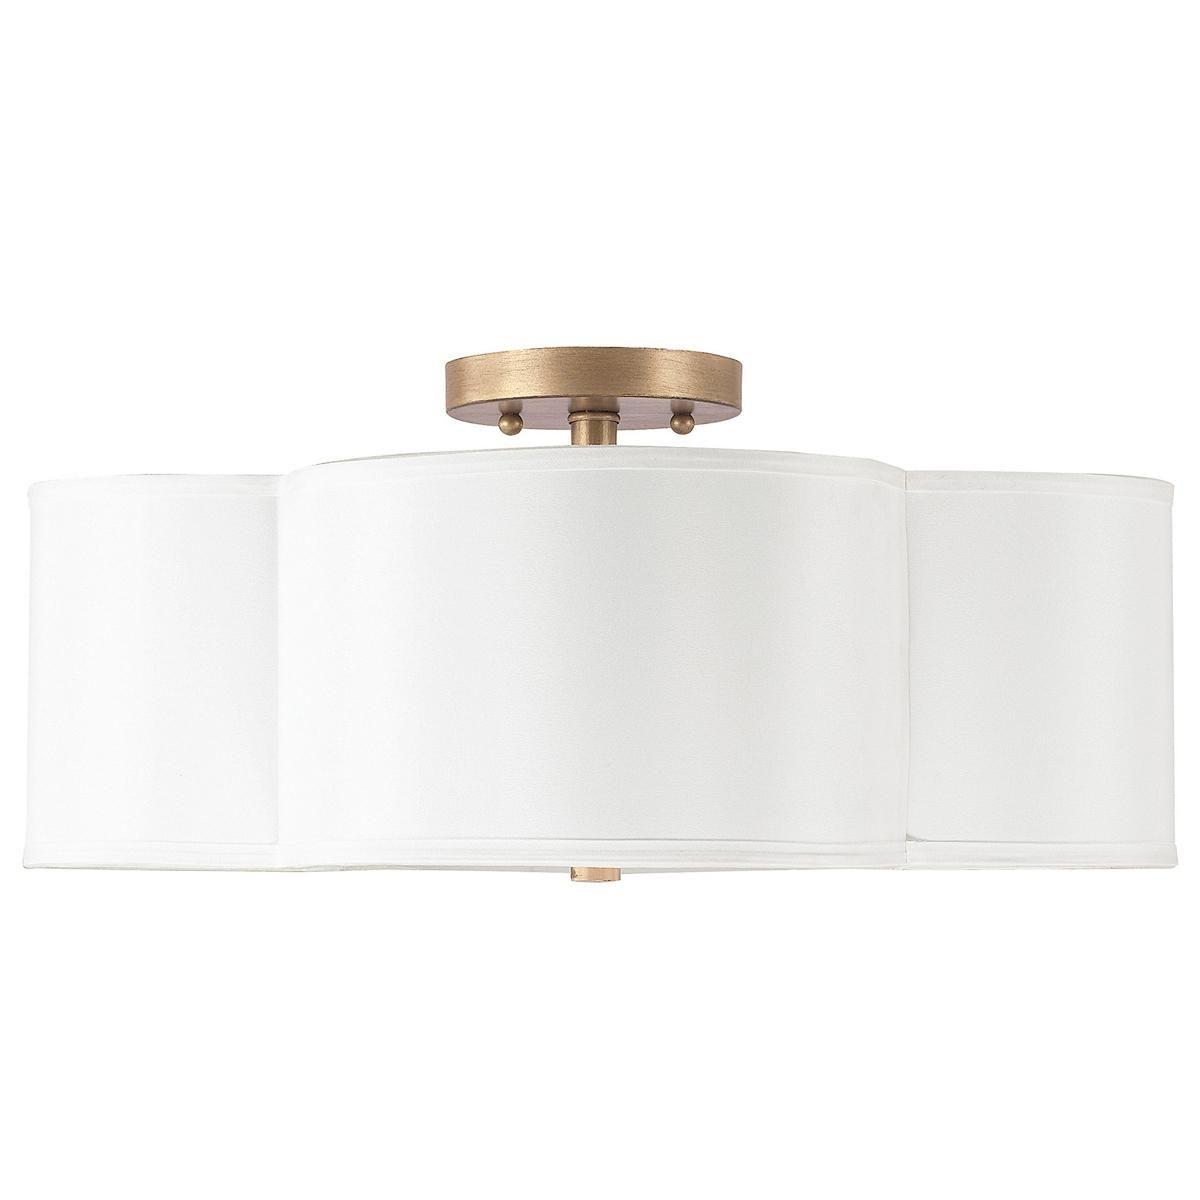 Scalloped Shade Semi-Flush Ceiling Light - 4 light | Semi ...